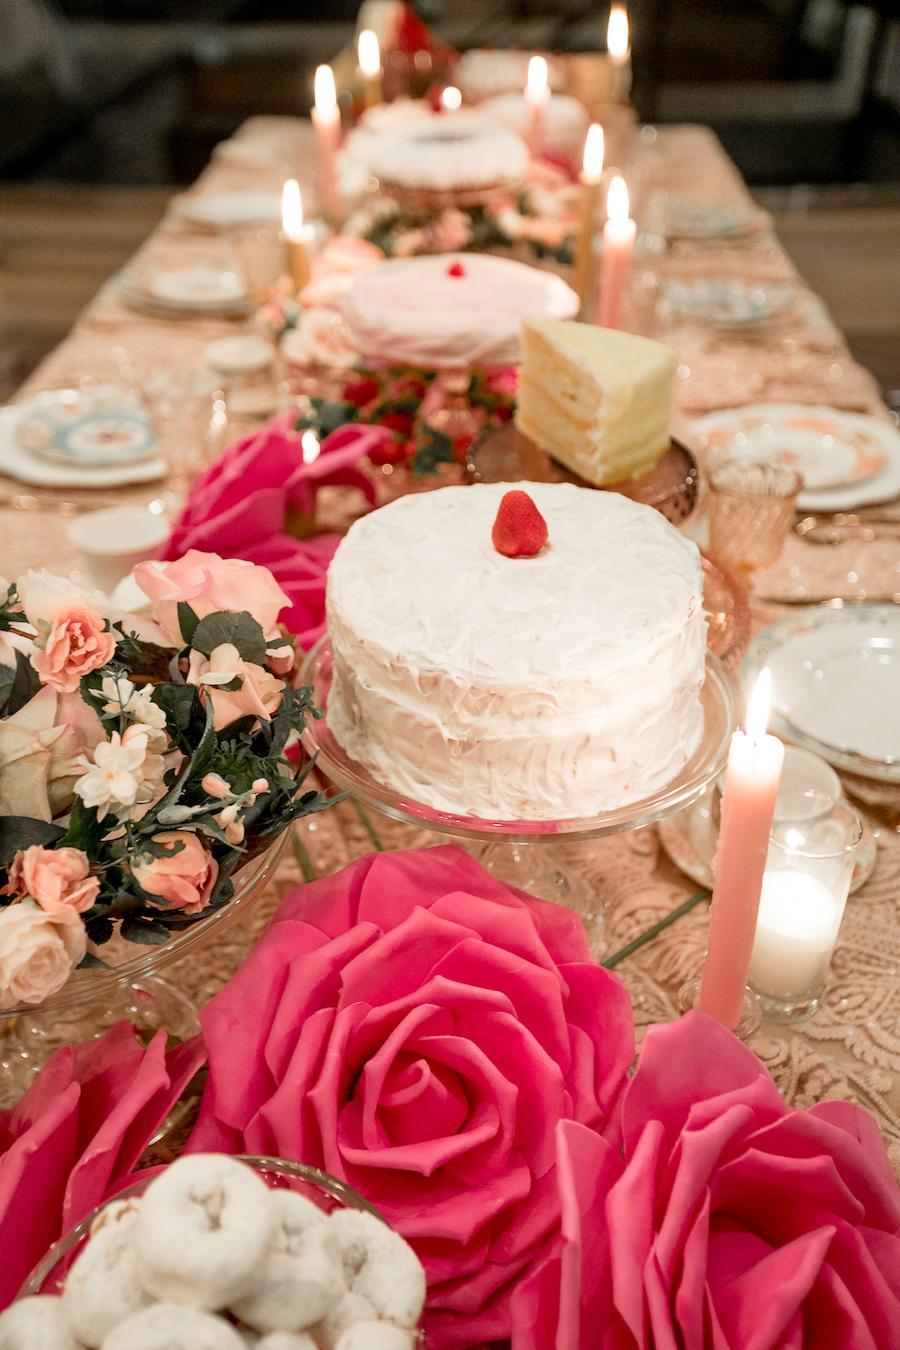 Amirah-kassem-let-them-eat-cake-hylah-white-special-events-rmine-katie-beverley-photography-16.jpg